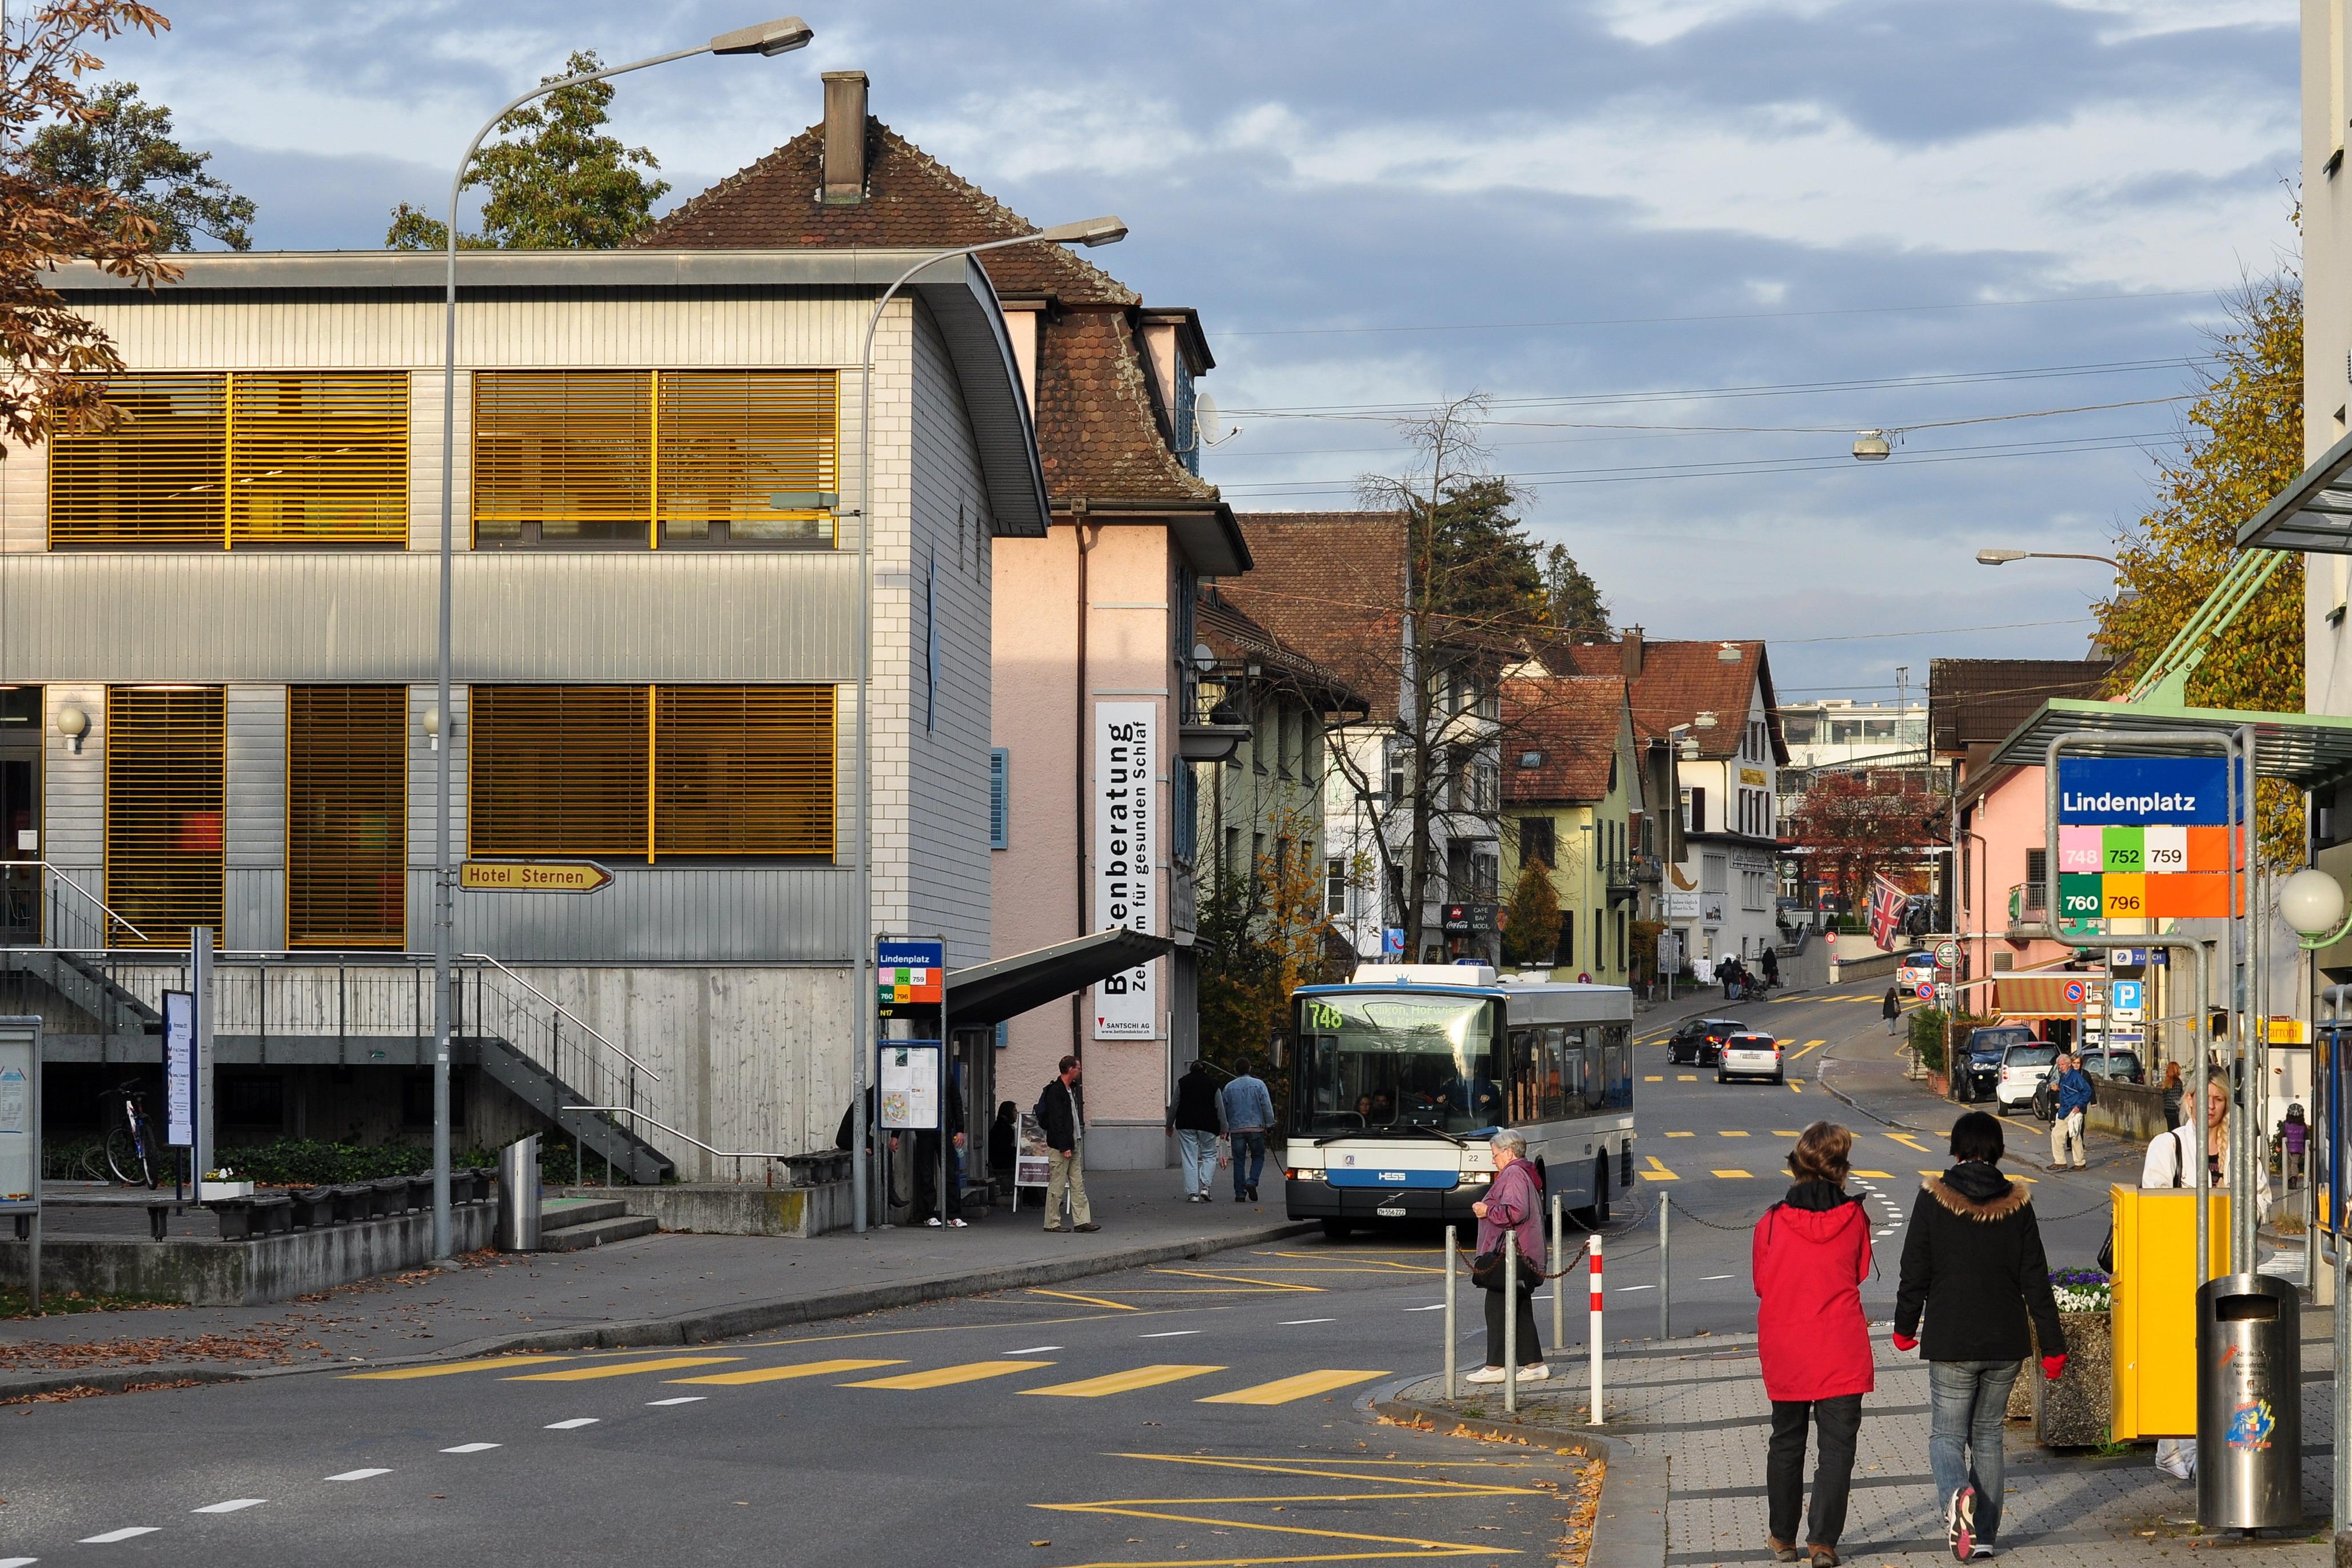 privates sex datum esch-uelzecht lokale dating site in dübendorf